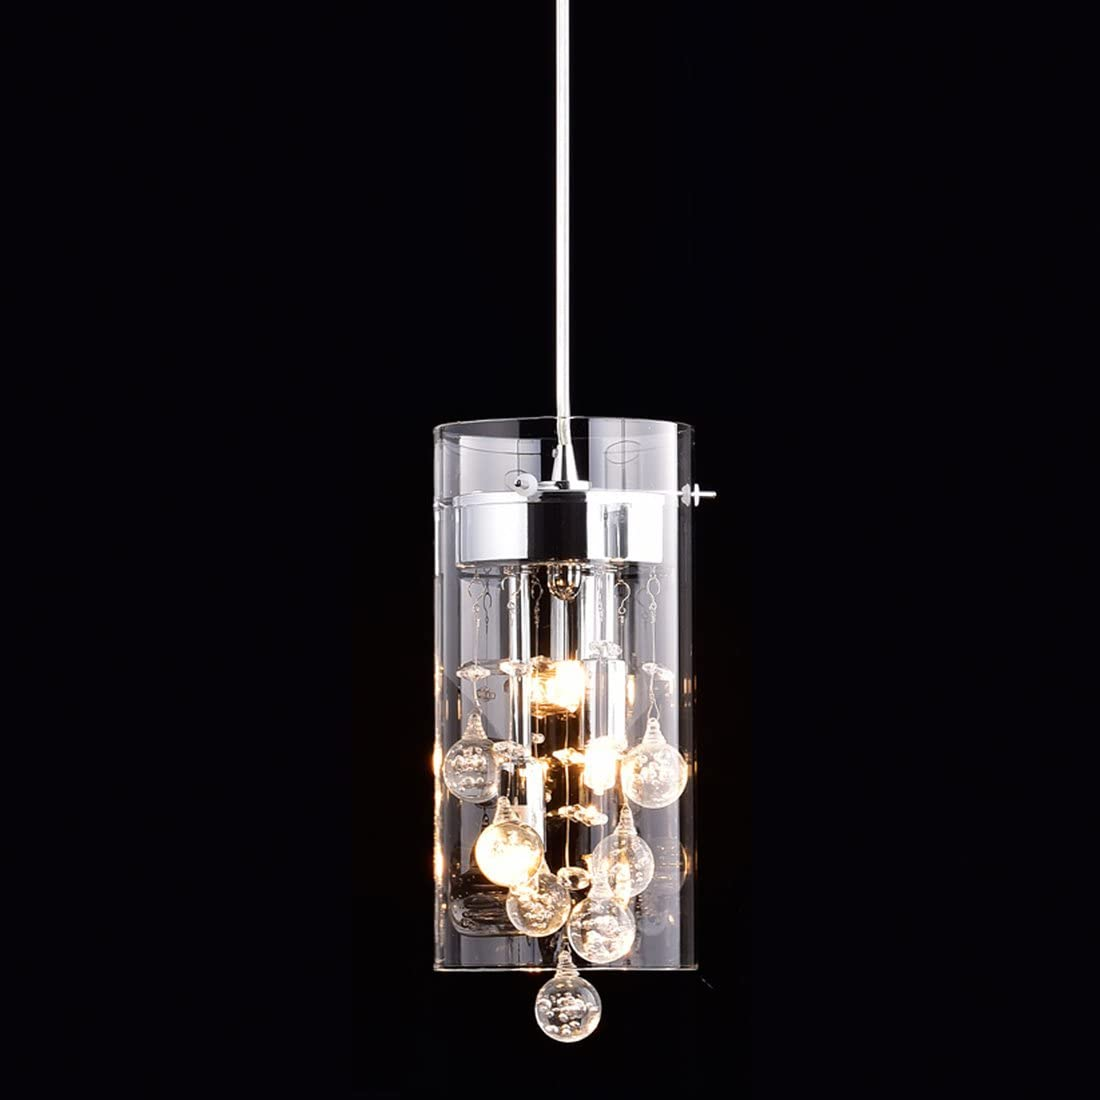 Truelite price Modern G9 Glass Pendant Crystal Hanging Max 89% OFF Light Fixture